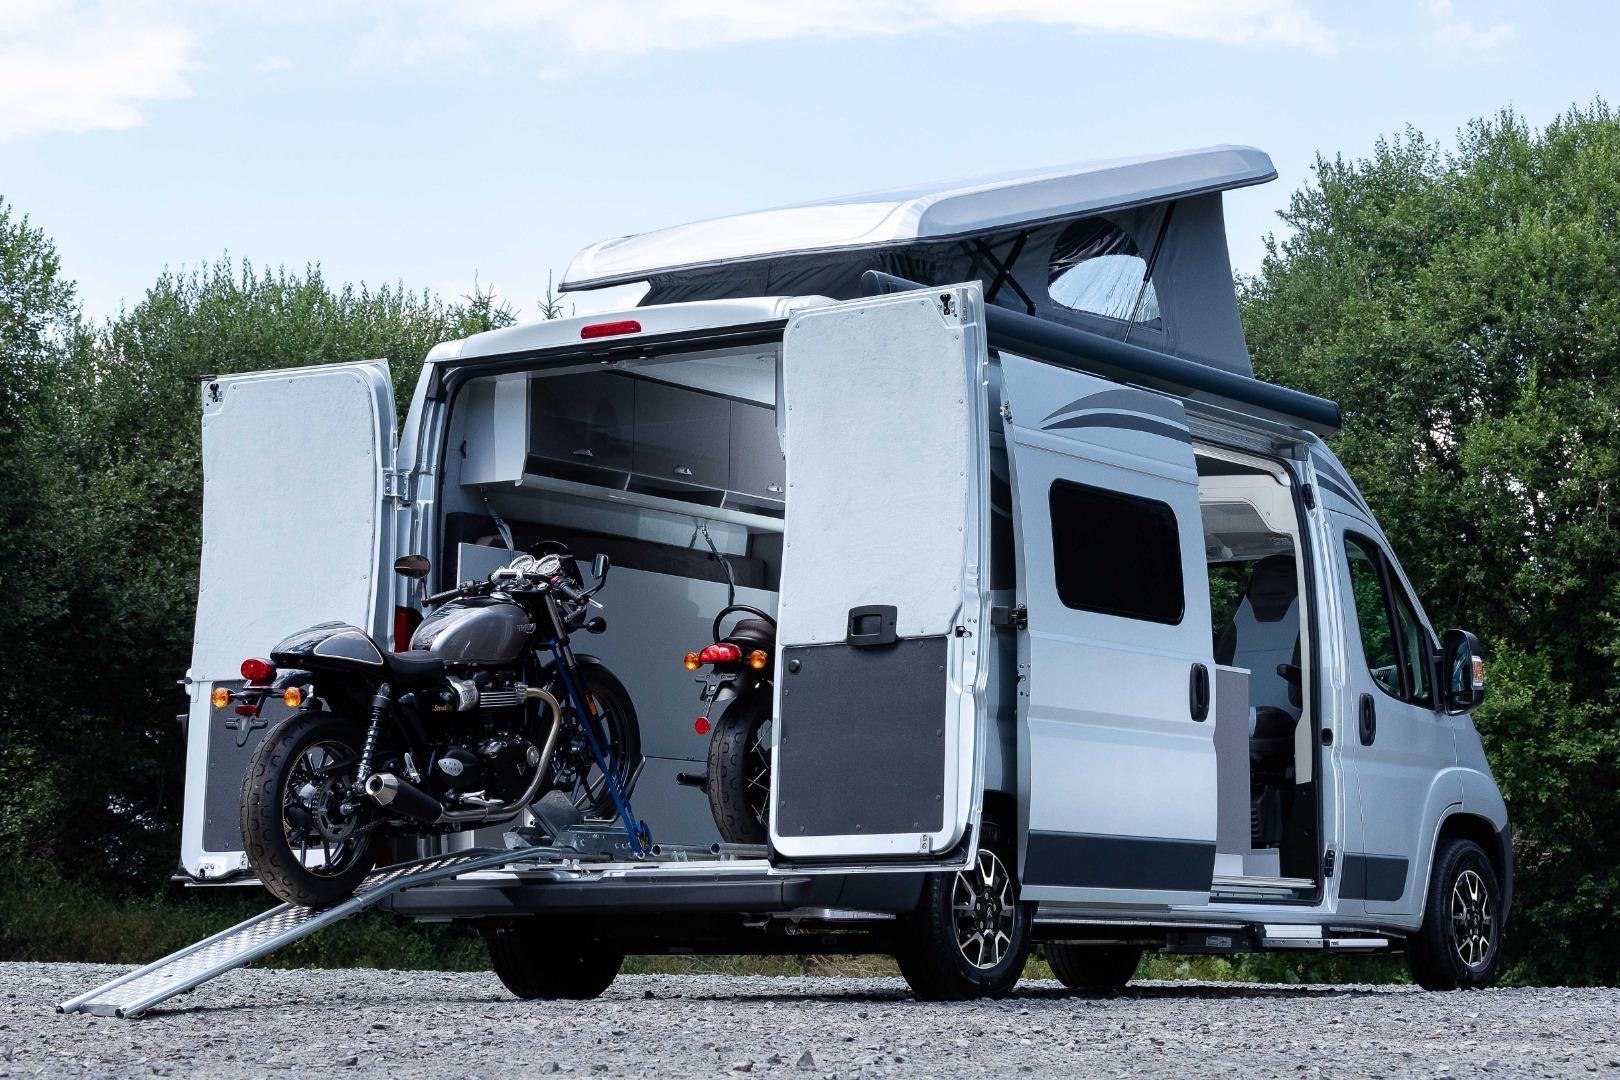 Citroën goes motorcycle camping with Jumper Biker camper van